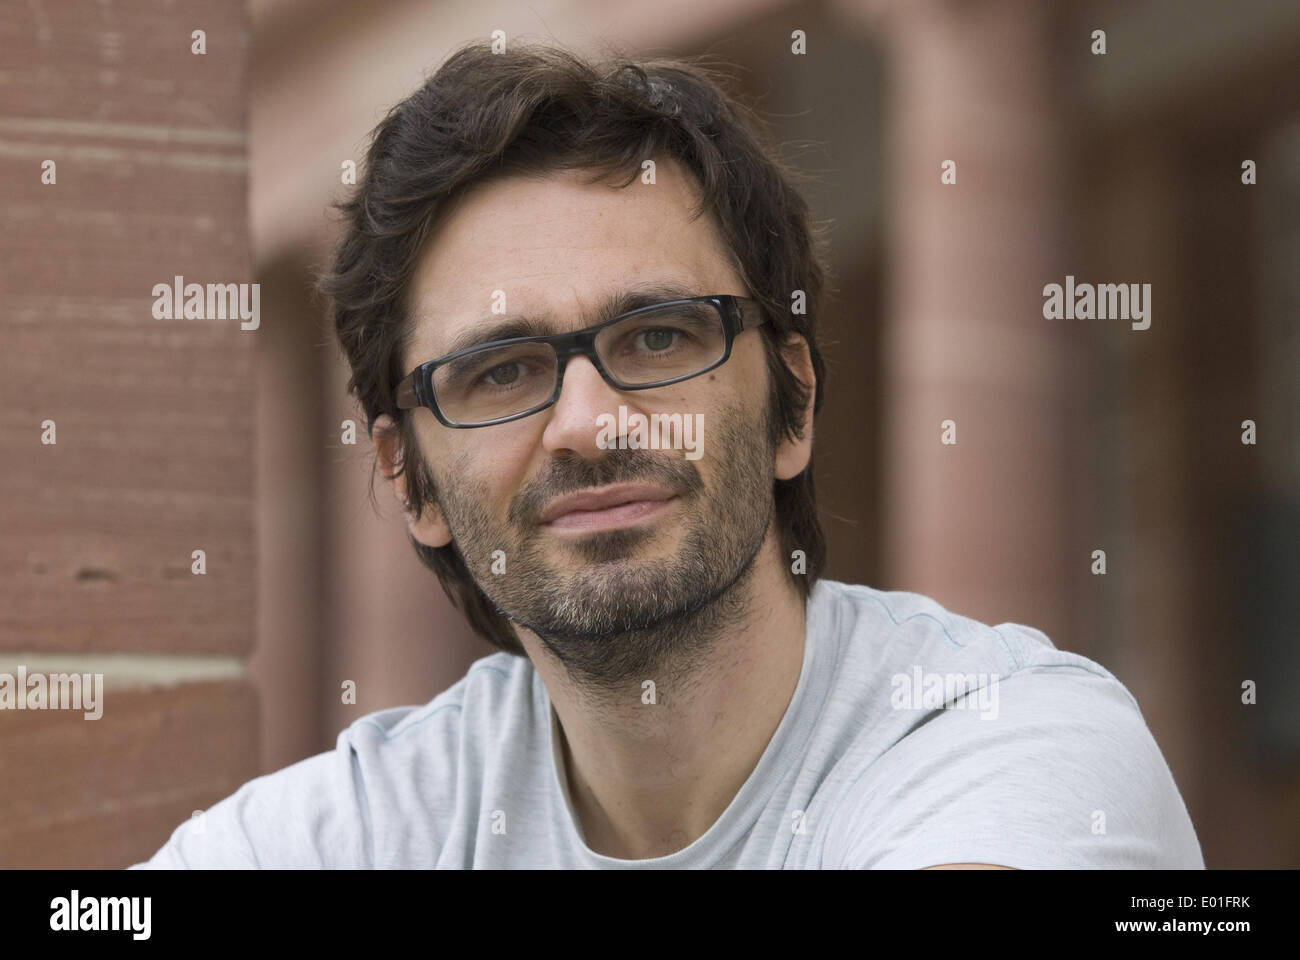 Nicol Ljubic - Stock Image